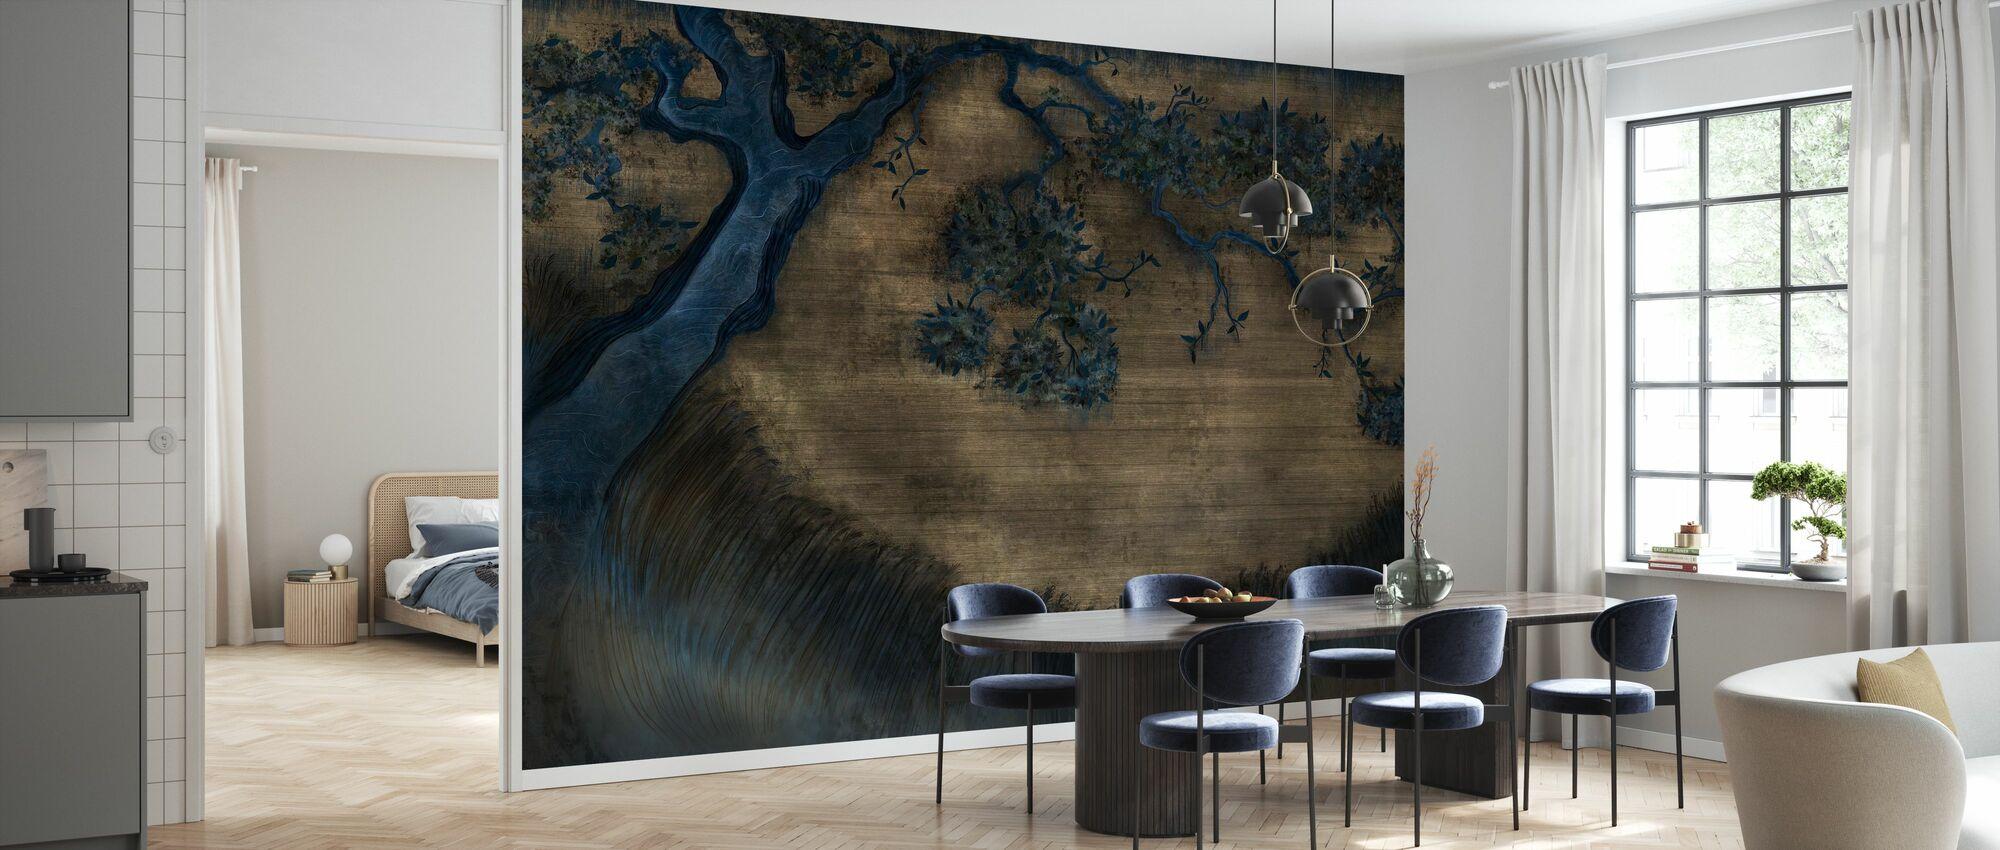 Glorious Tree - Hazel - Wallpaper - Kitchen